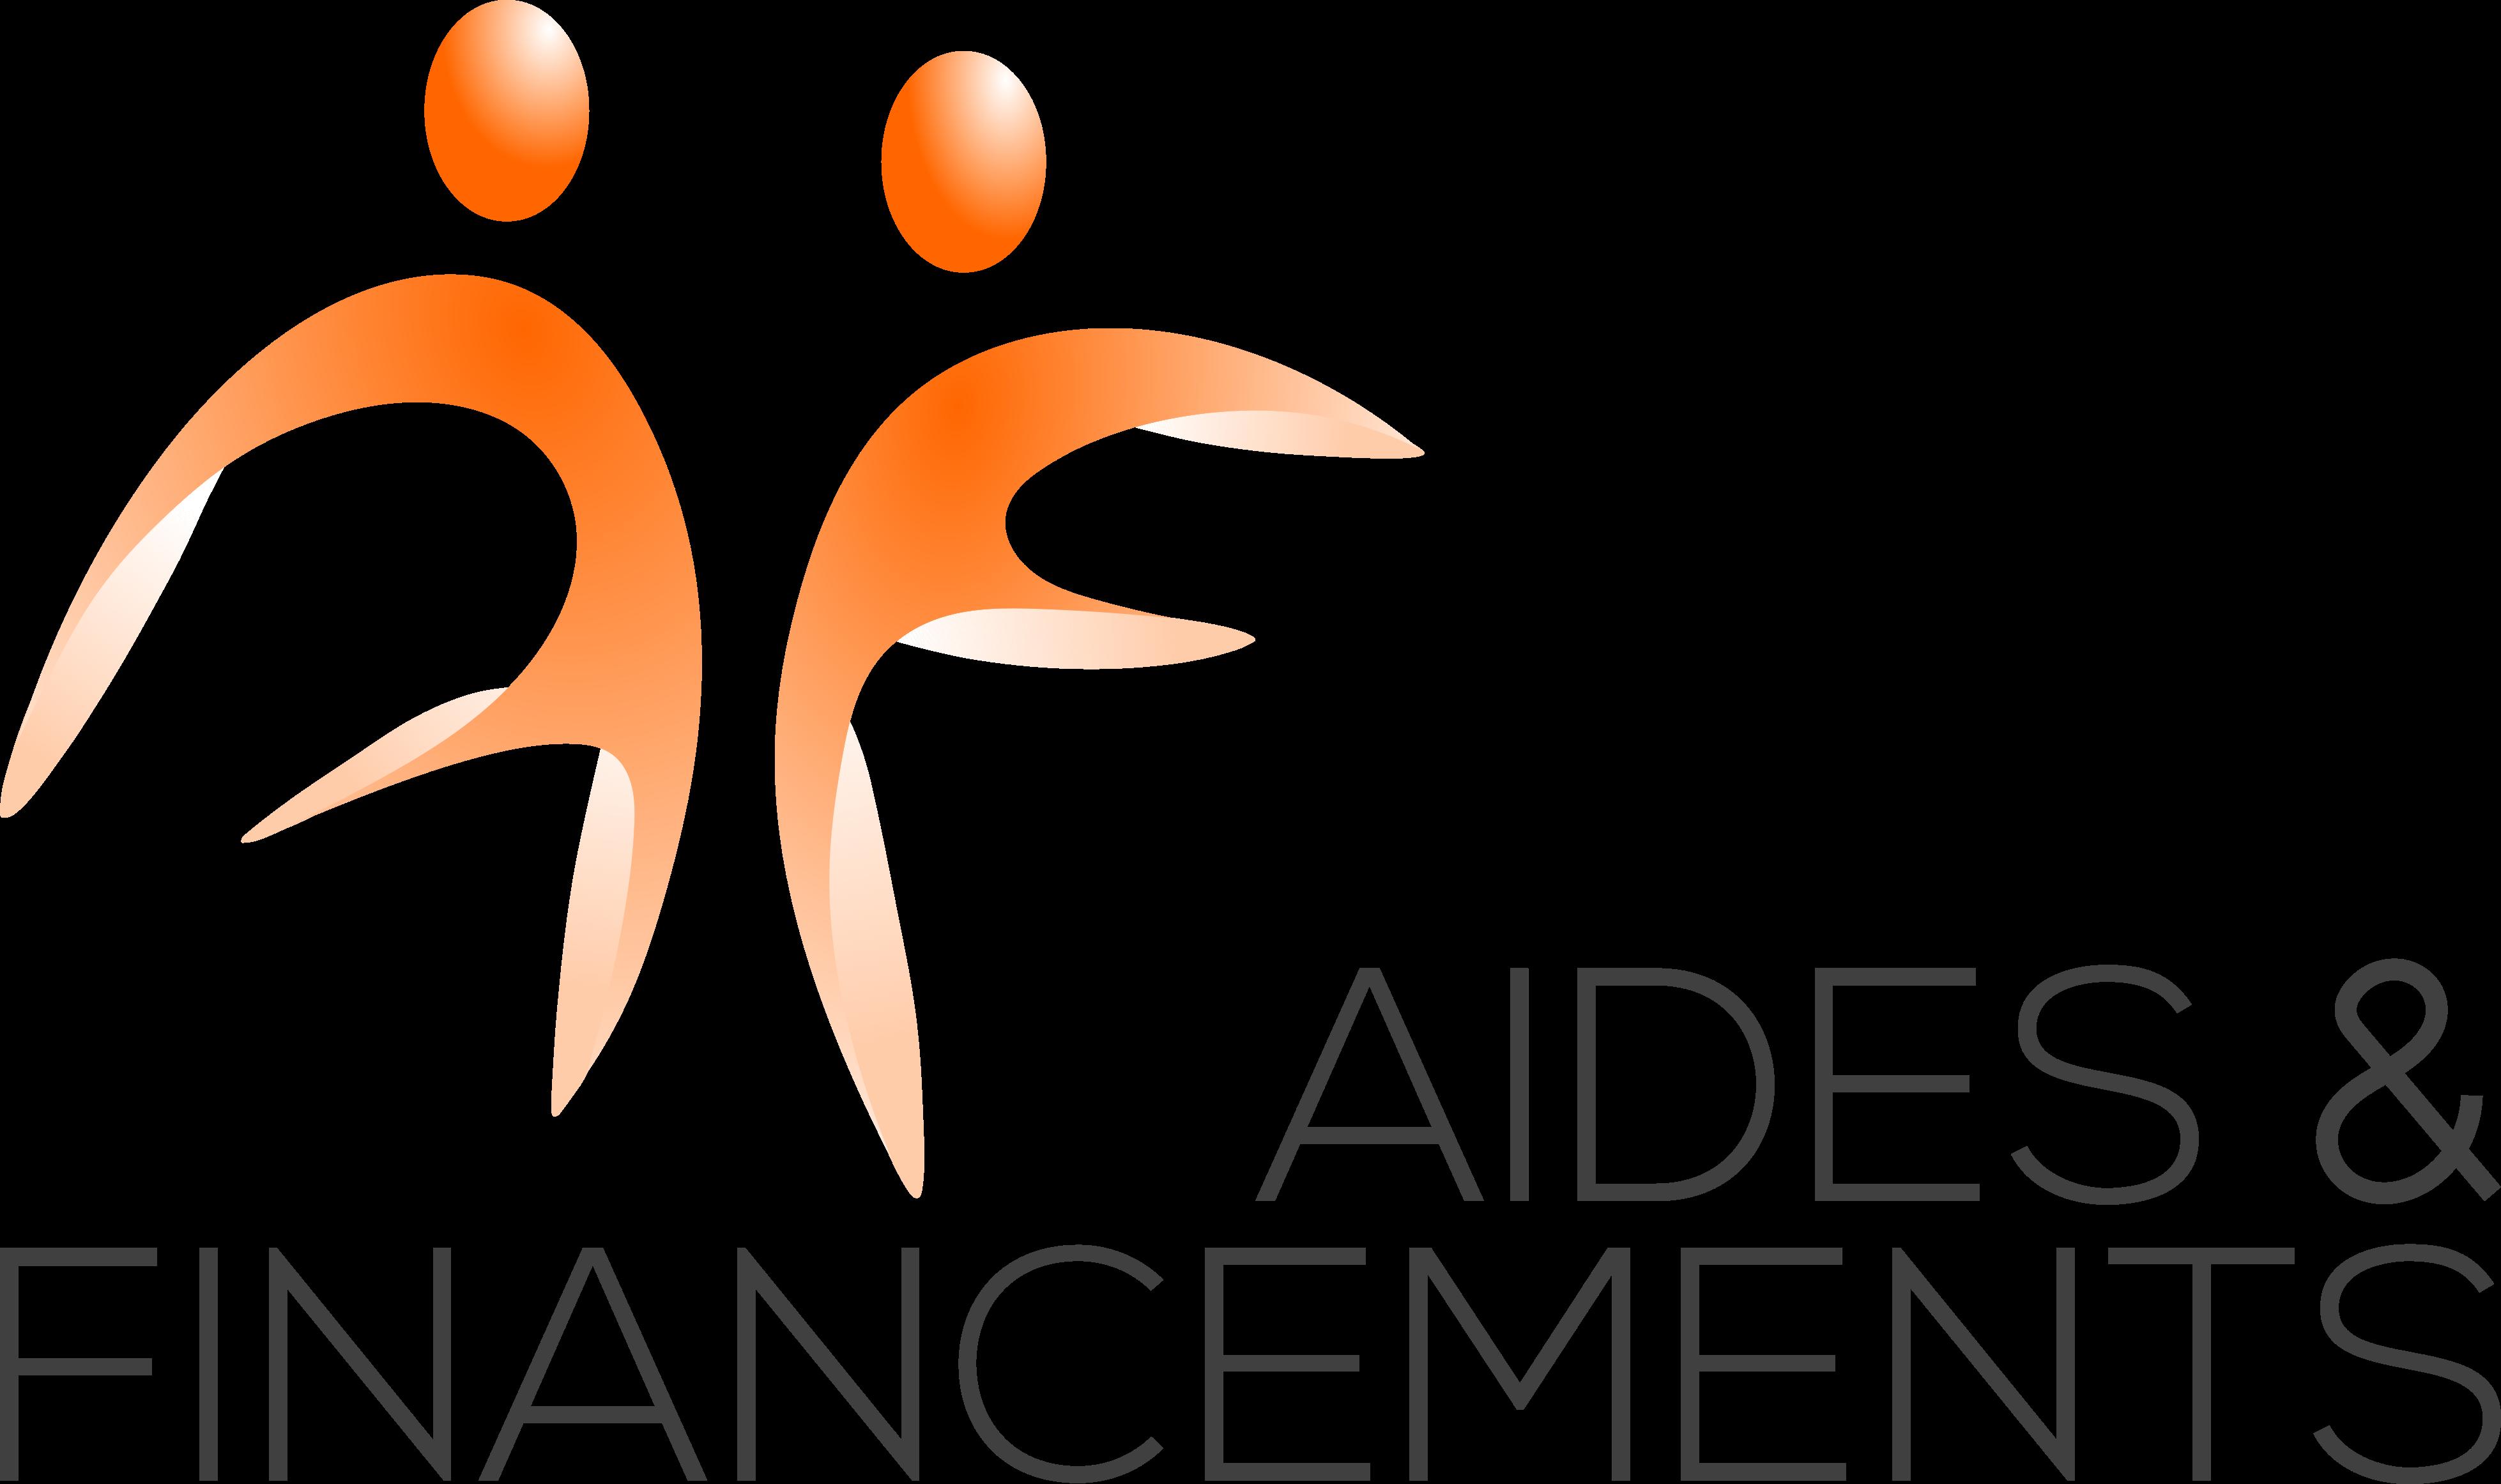 AIDES & FINANCEMENTS